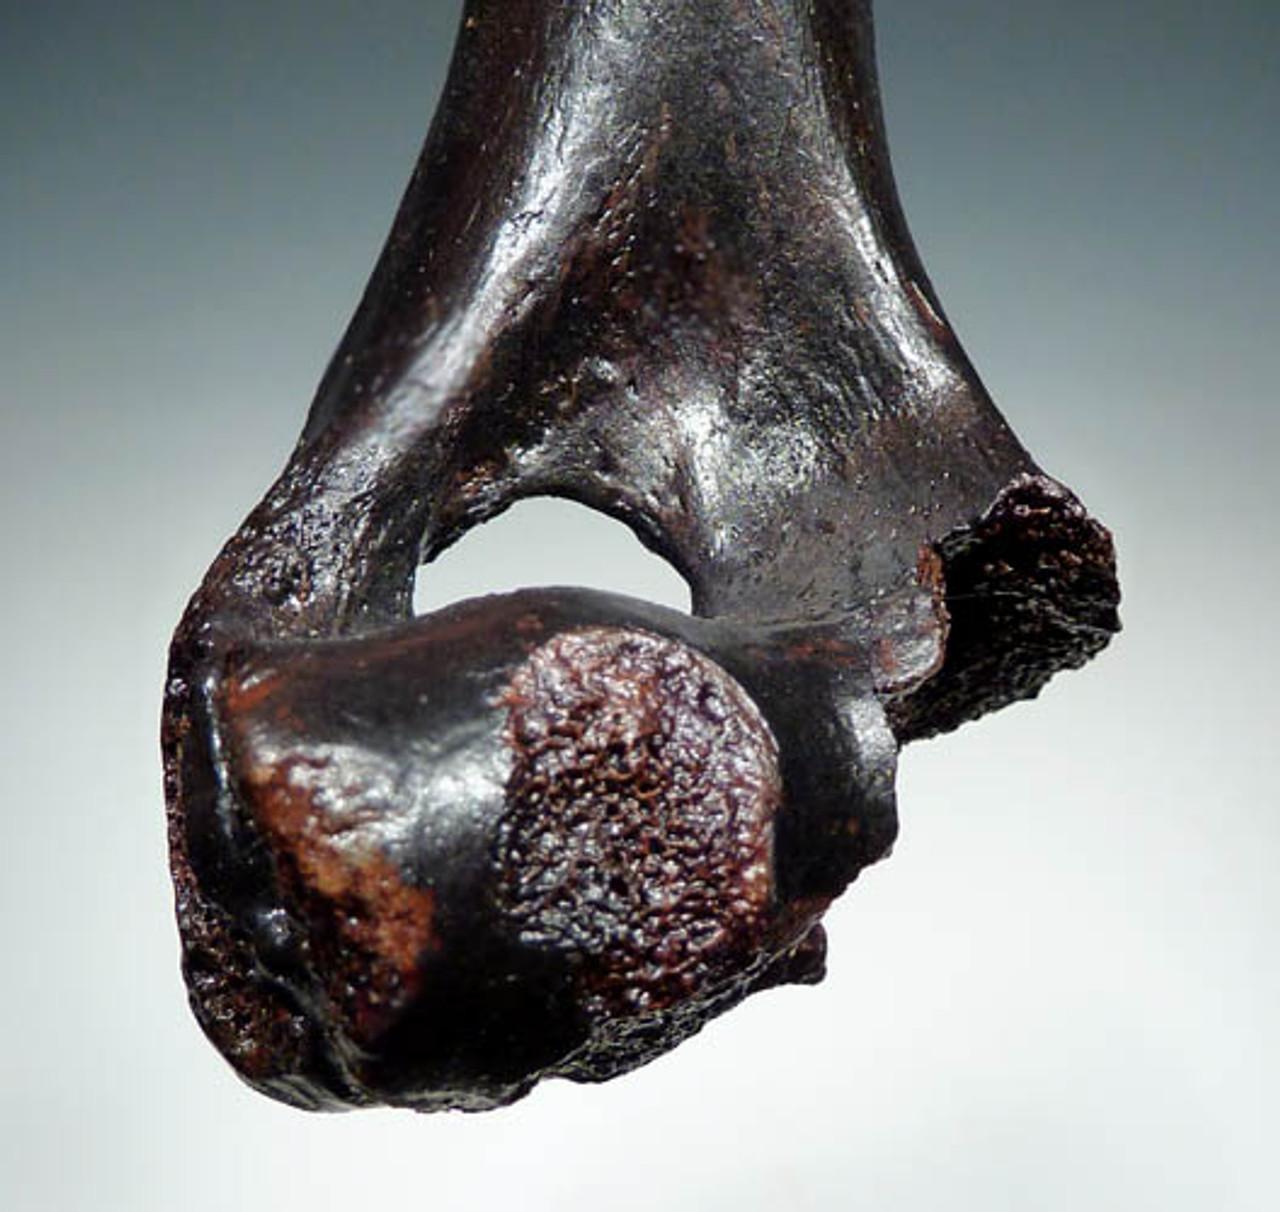 EUROPEAN CAVE HYENA HUMERUS BONE WITH LARGE PREDATOR BITE MARKS *LMX041